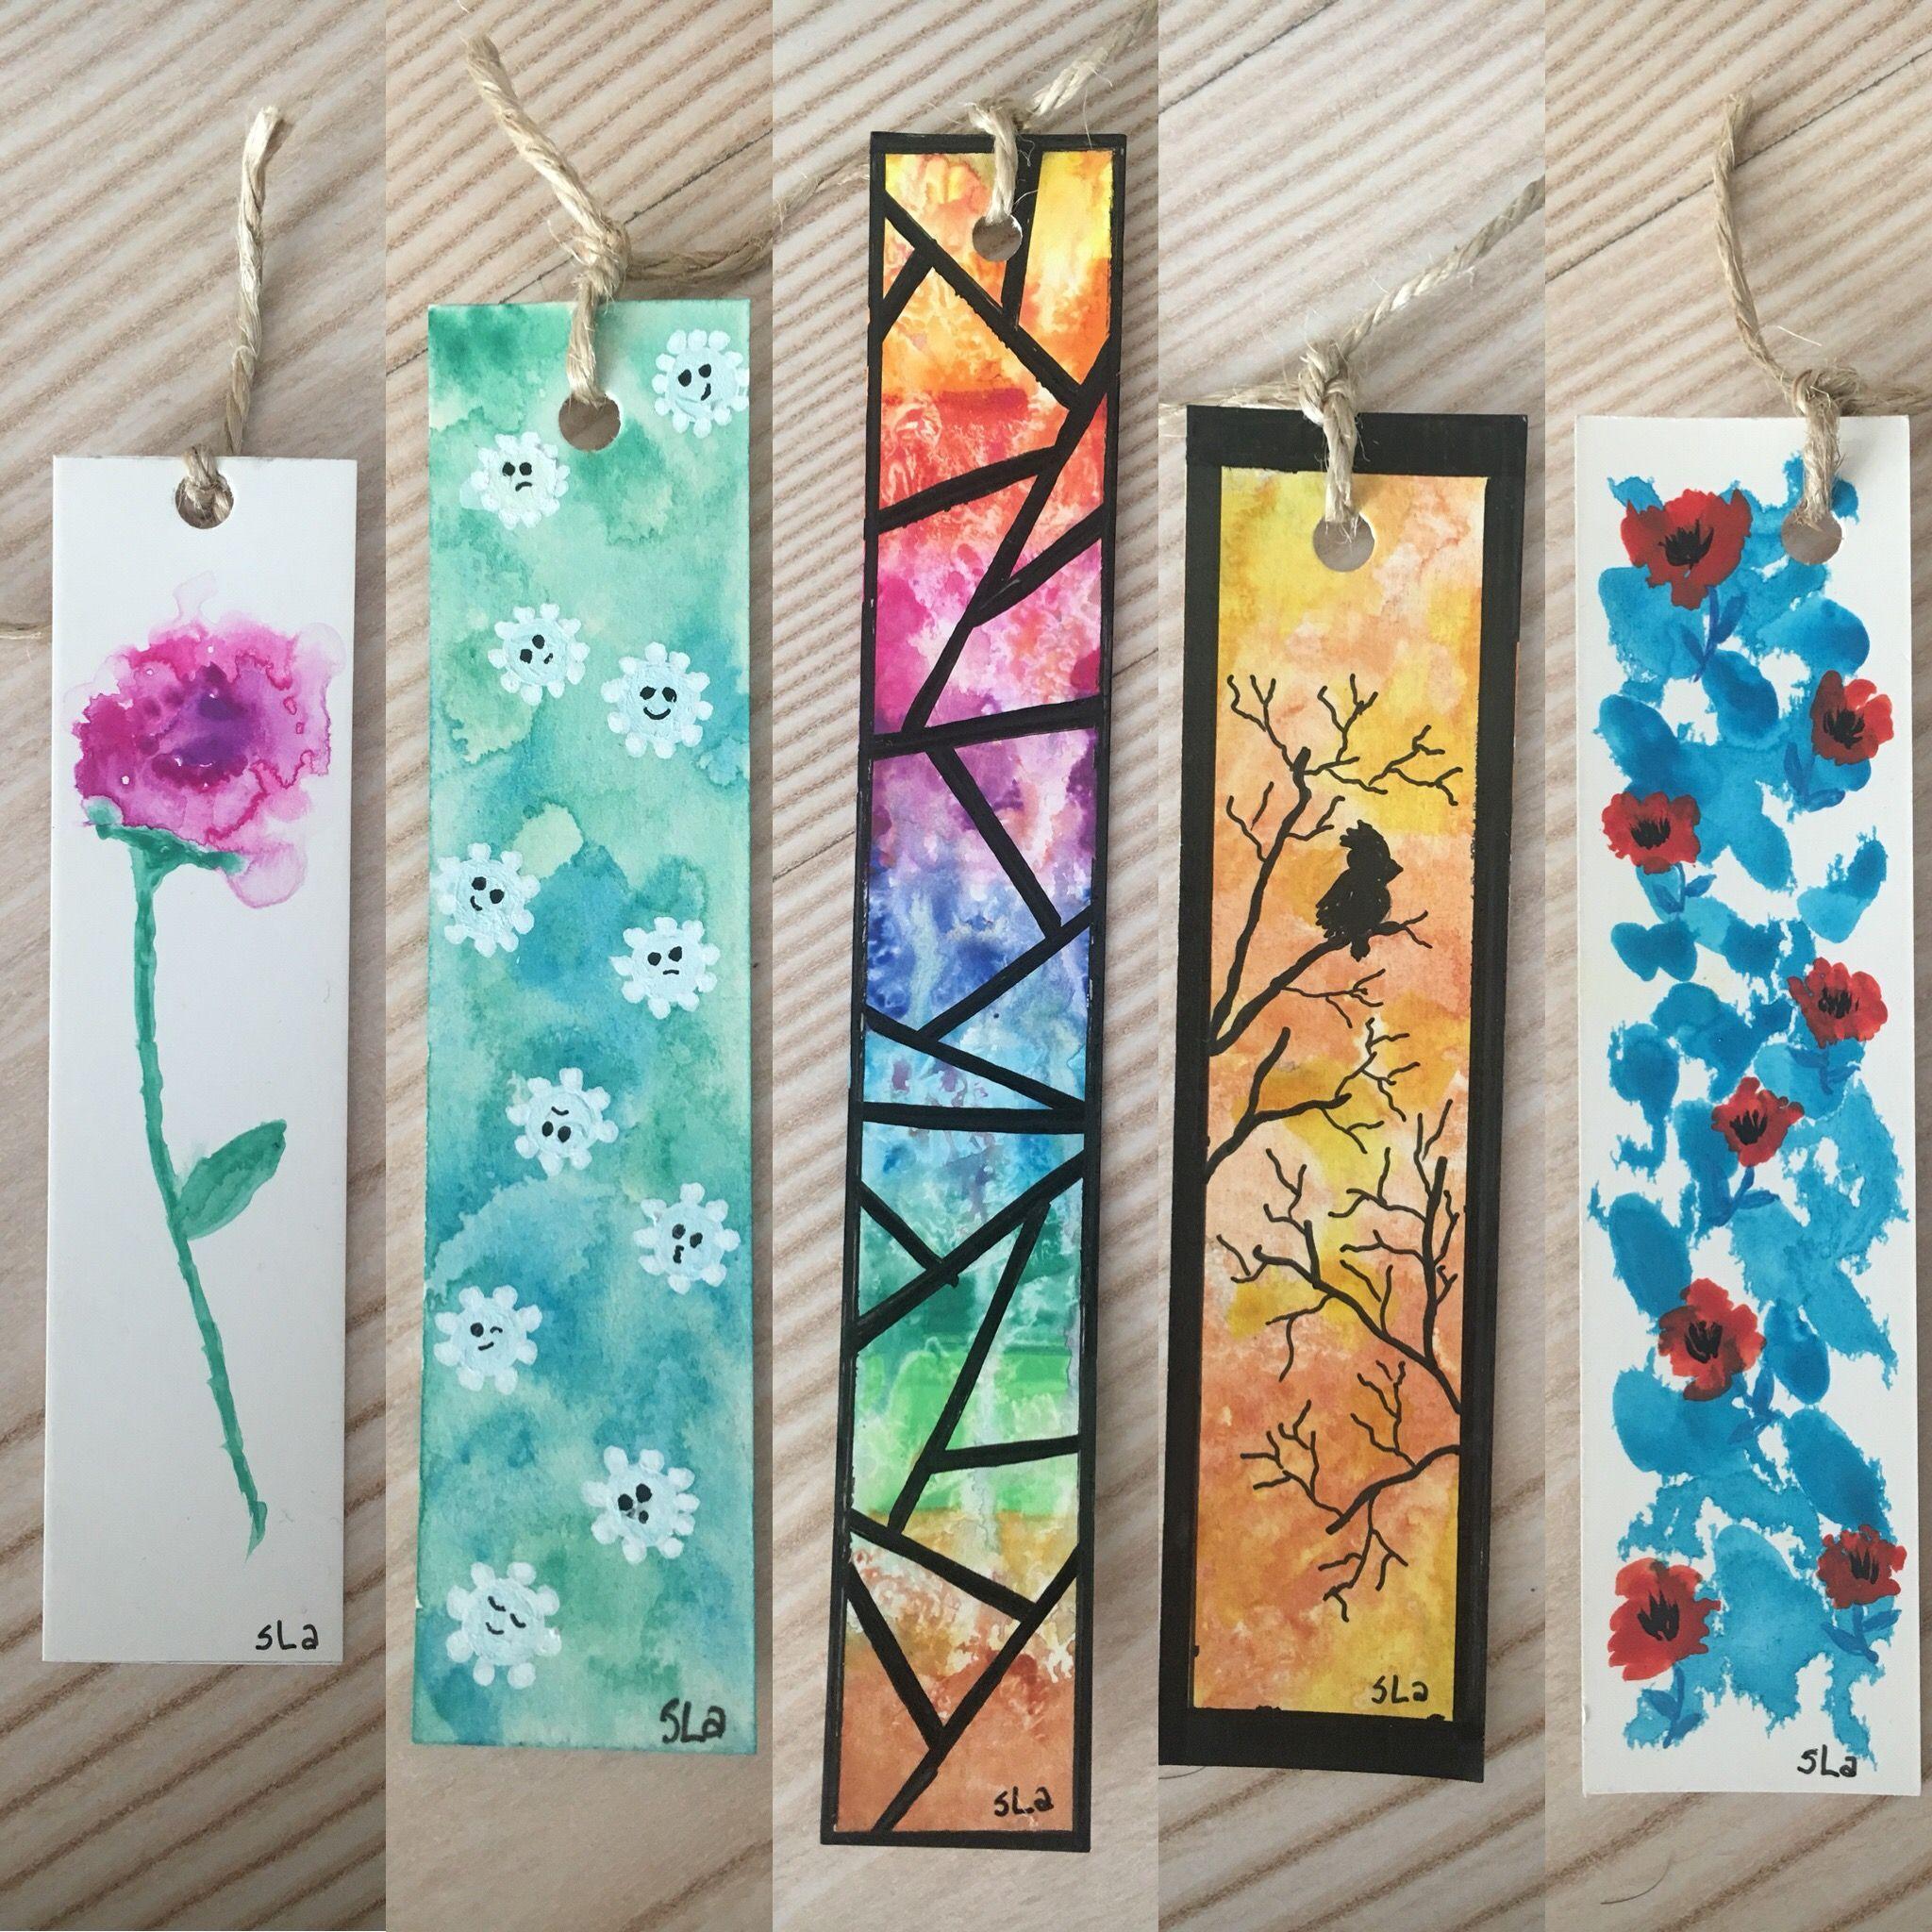 Watercolor Bookmarks Watercolor Bookmarks Bookmarks Handmade Creative Bookmarks